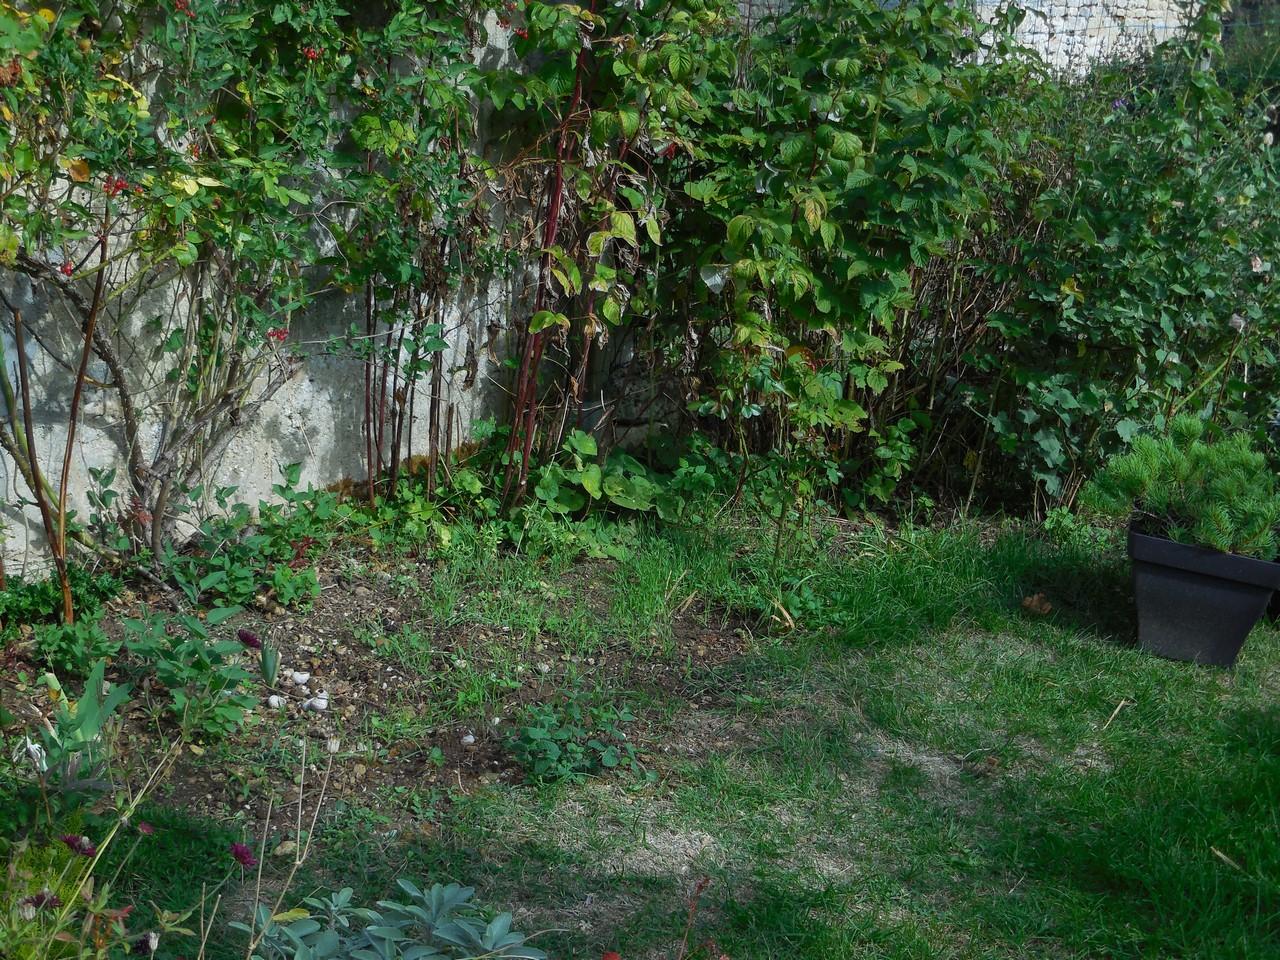 cagouille 39 s garden botanic la griffe de jardin. Black Bedroom Furniture Sets. Home Design Ideas